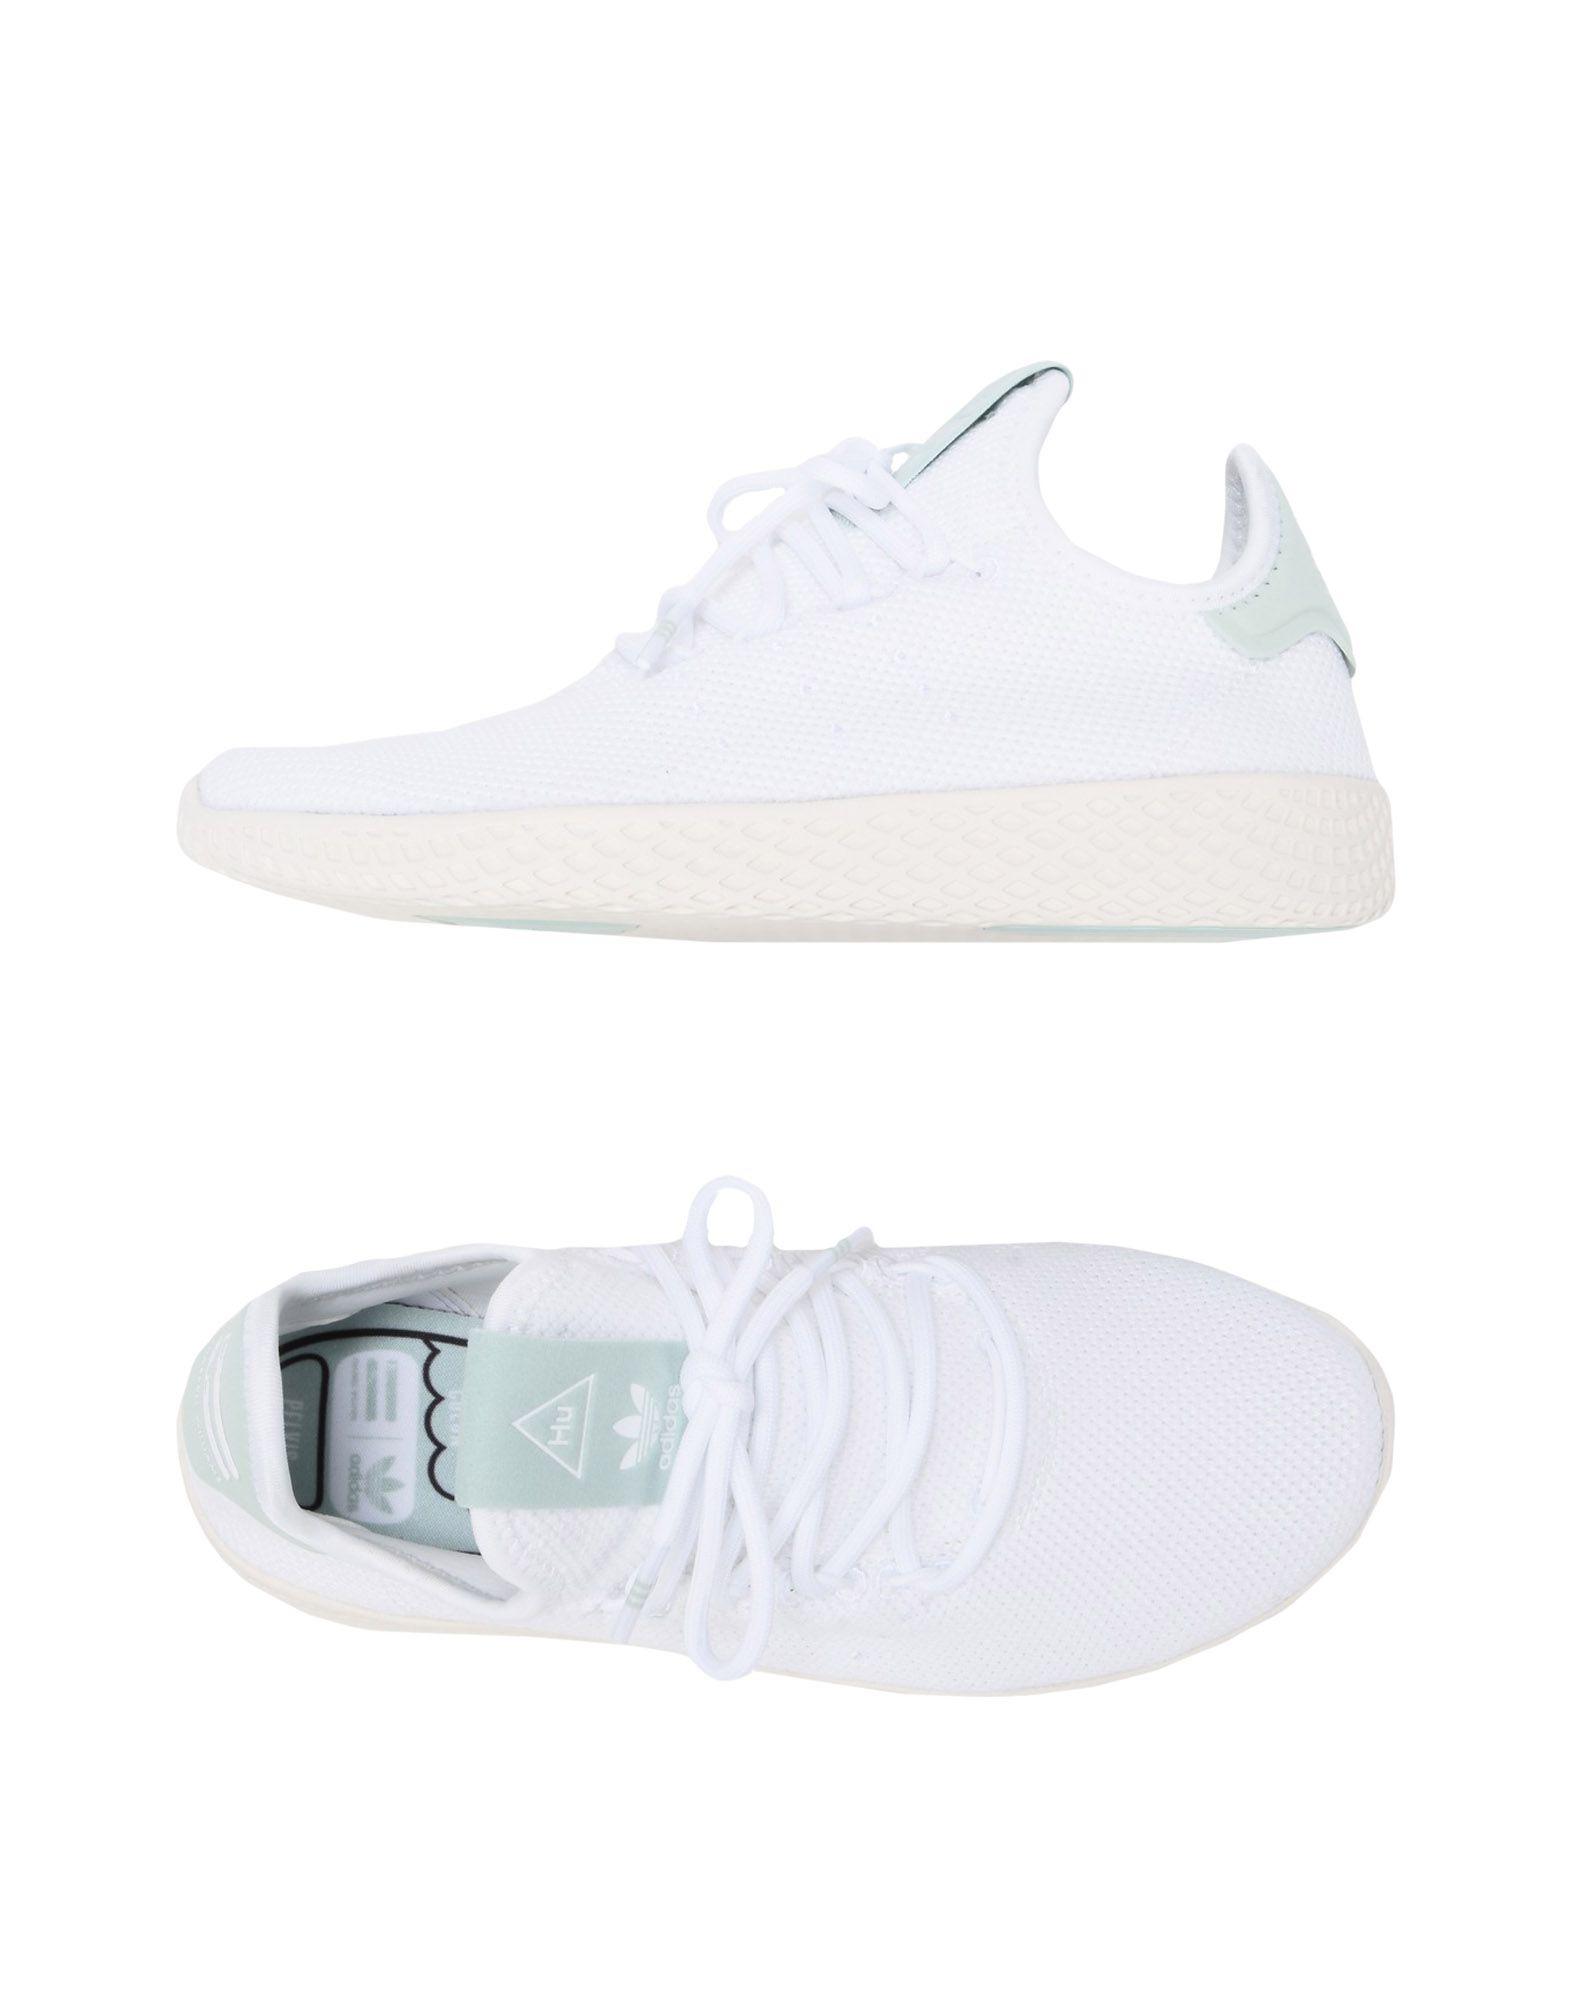 Adidas Originals By Pharrell Williams Pw Tennis Hu  11459465VN Gute Qualität beliebte Schuhe